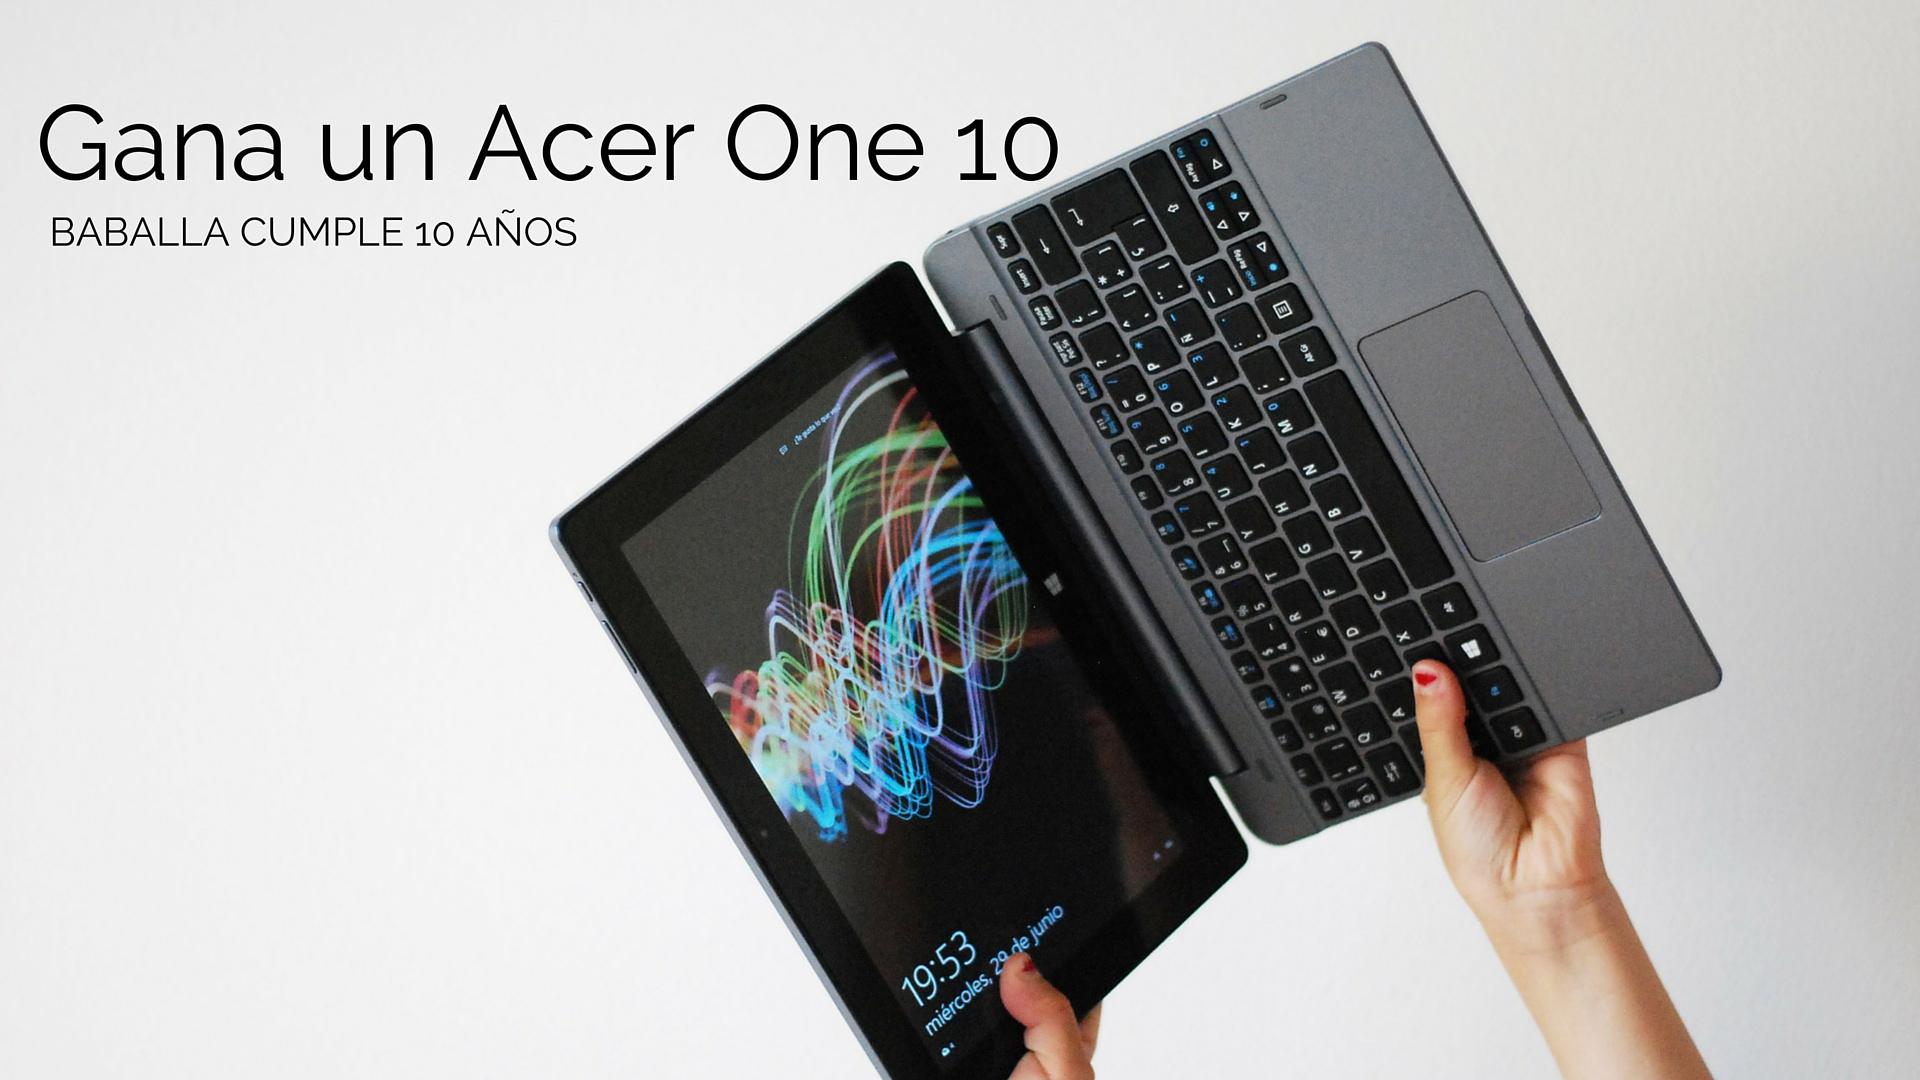 Gana un Acer One10